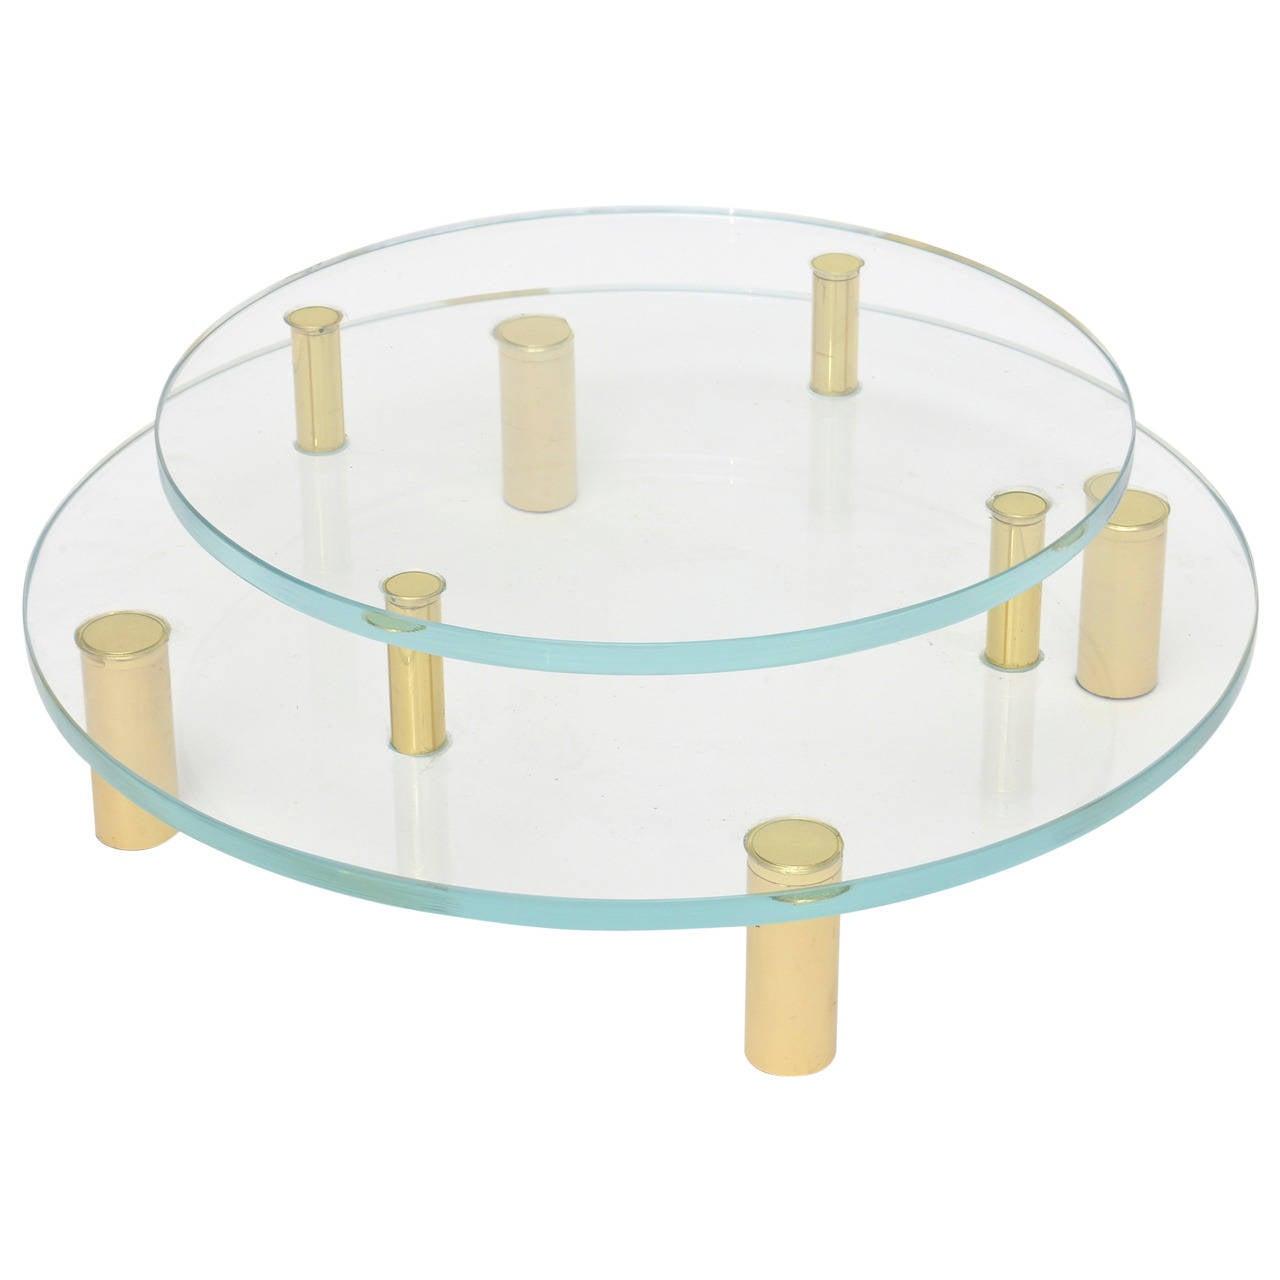 Modernist Two-Tiered Circular Brass and Glass Sculptural Centerpiece / SALE